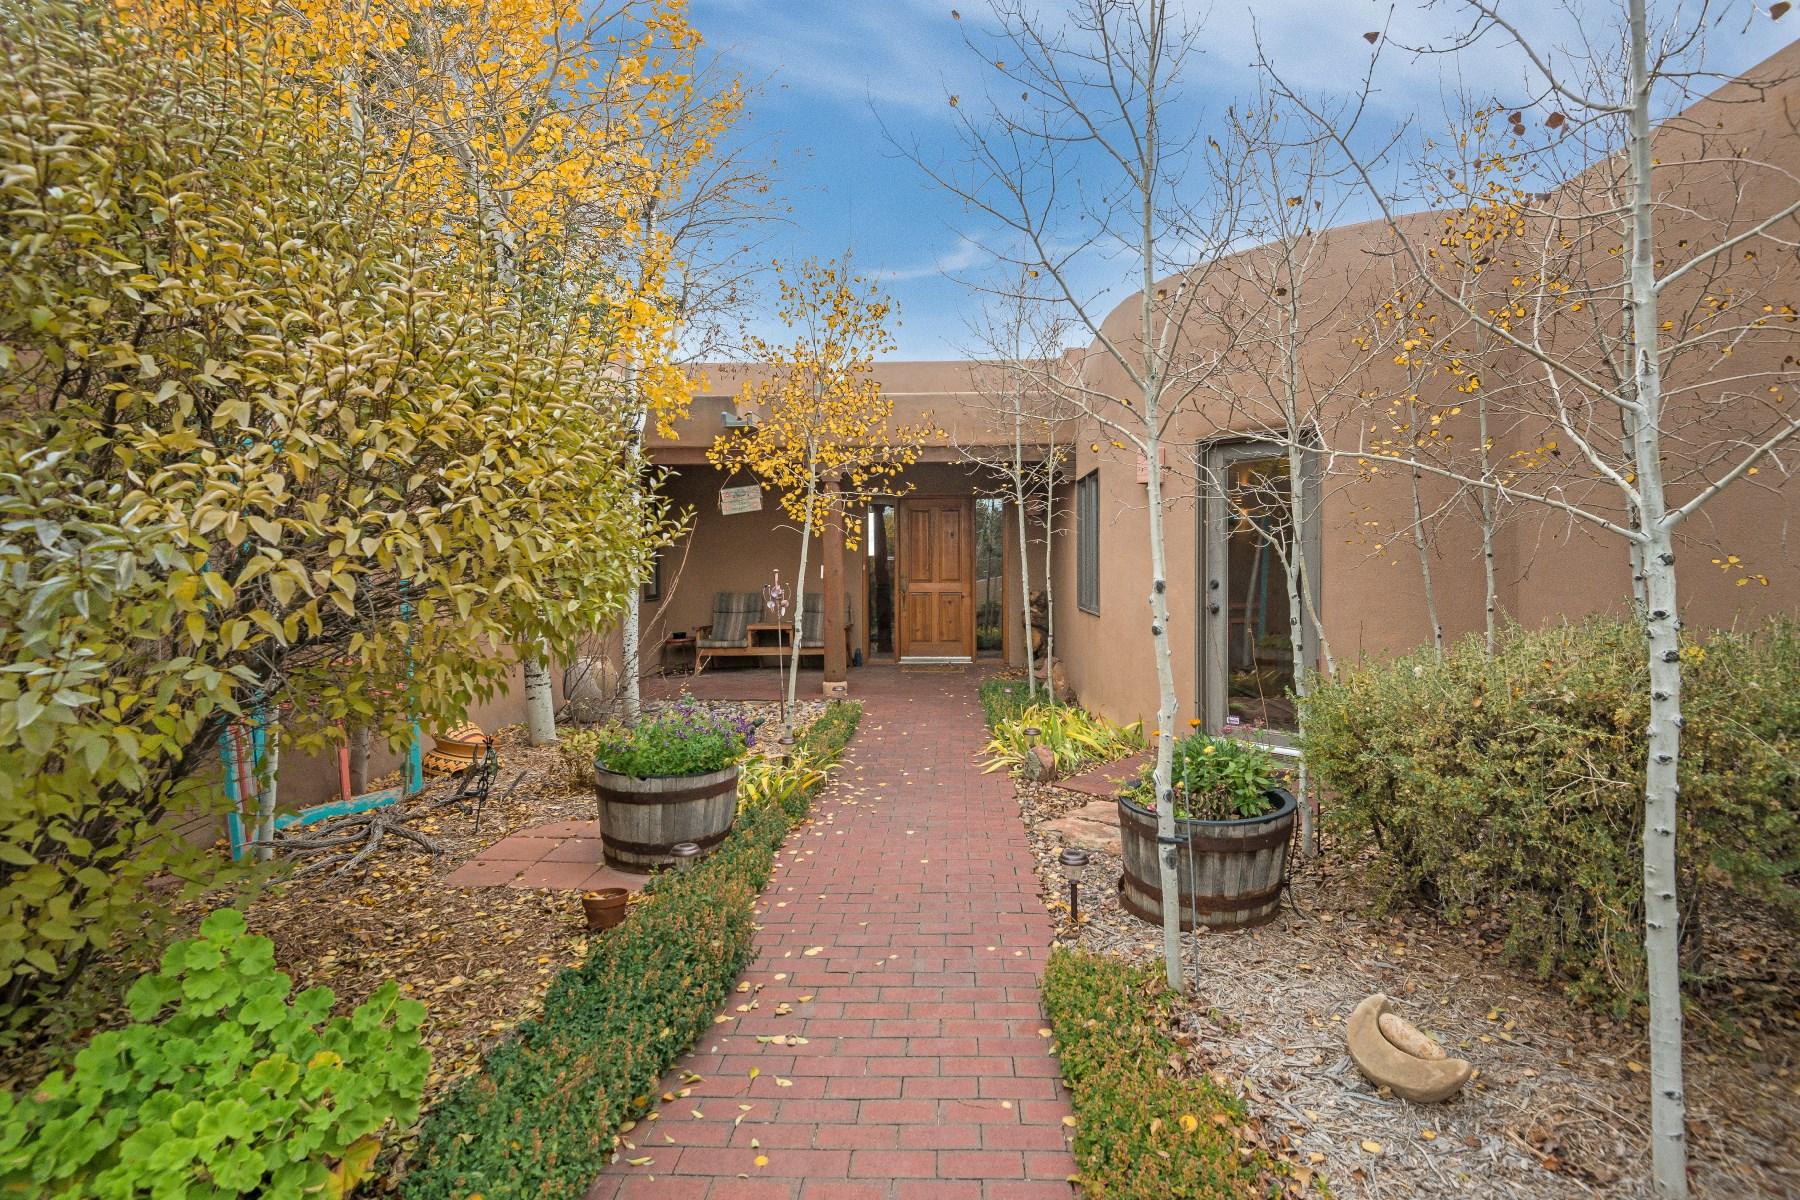 Single Family Home for Sale at 4 Caliente Road Eldorado, Santa Fe, New Mexico 87508 United States